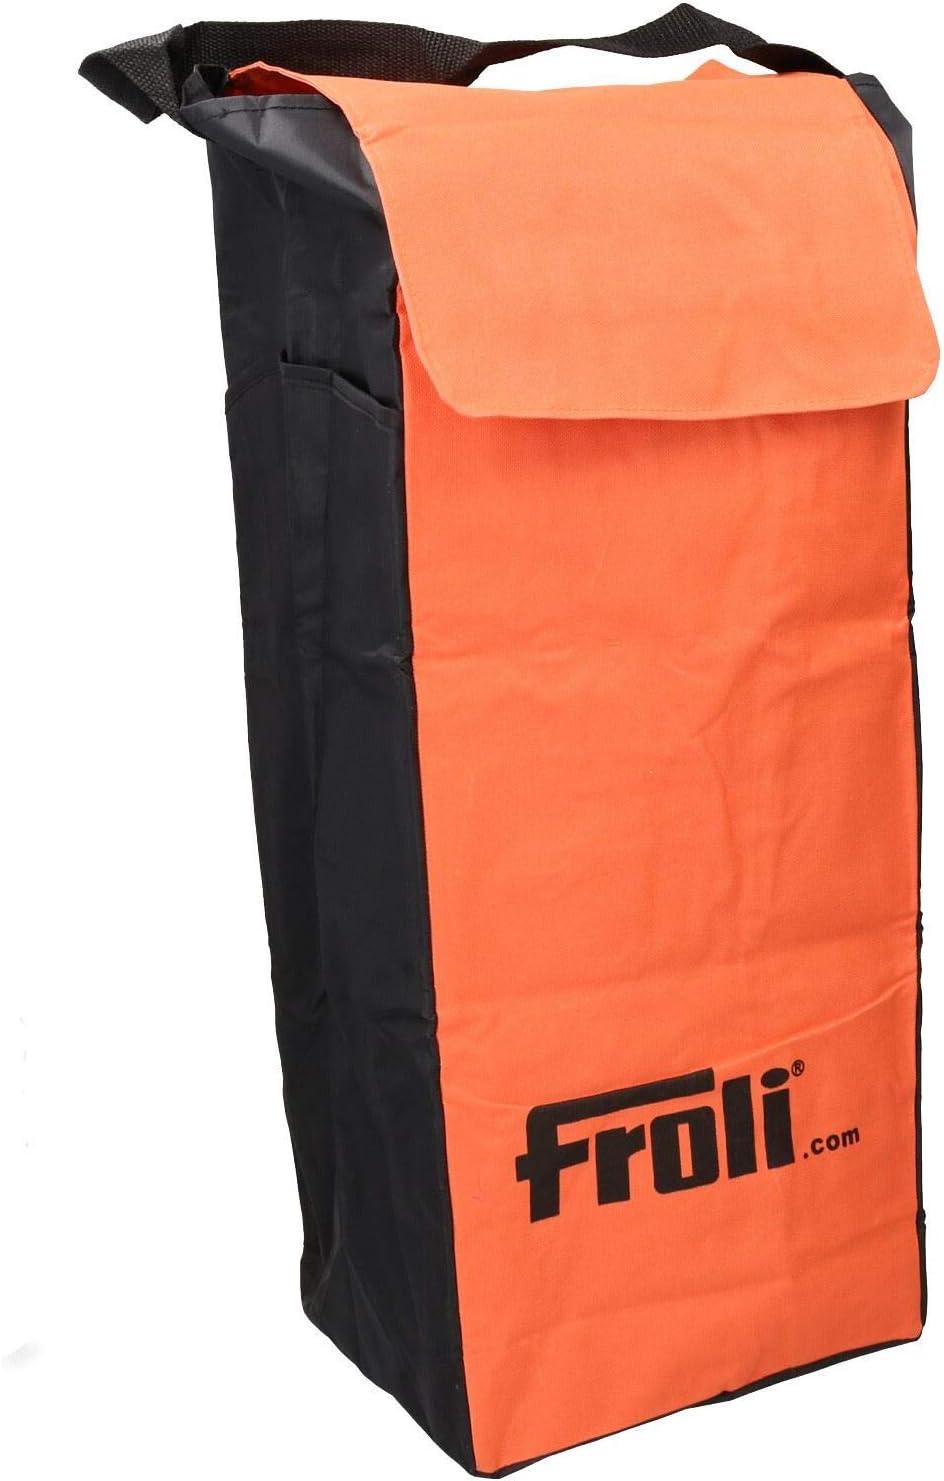 AB Tools Froli Camping Caravane Rampe de Mise a Niveau Set Pack de 2 Cales de Roue 5T